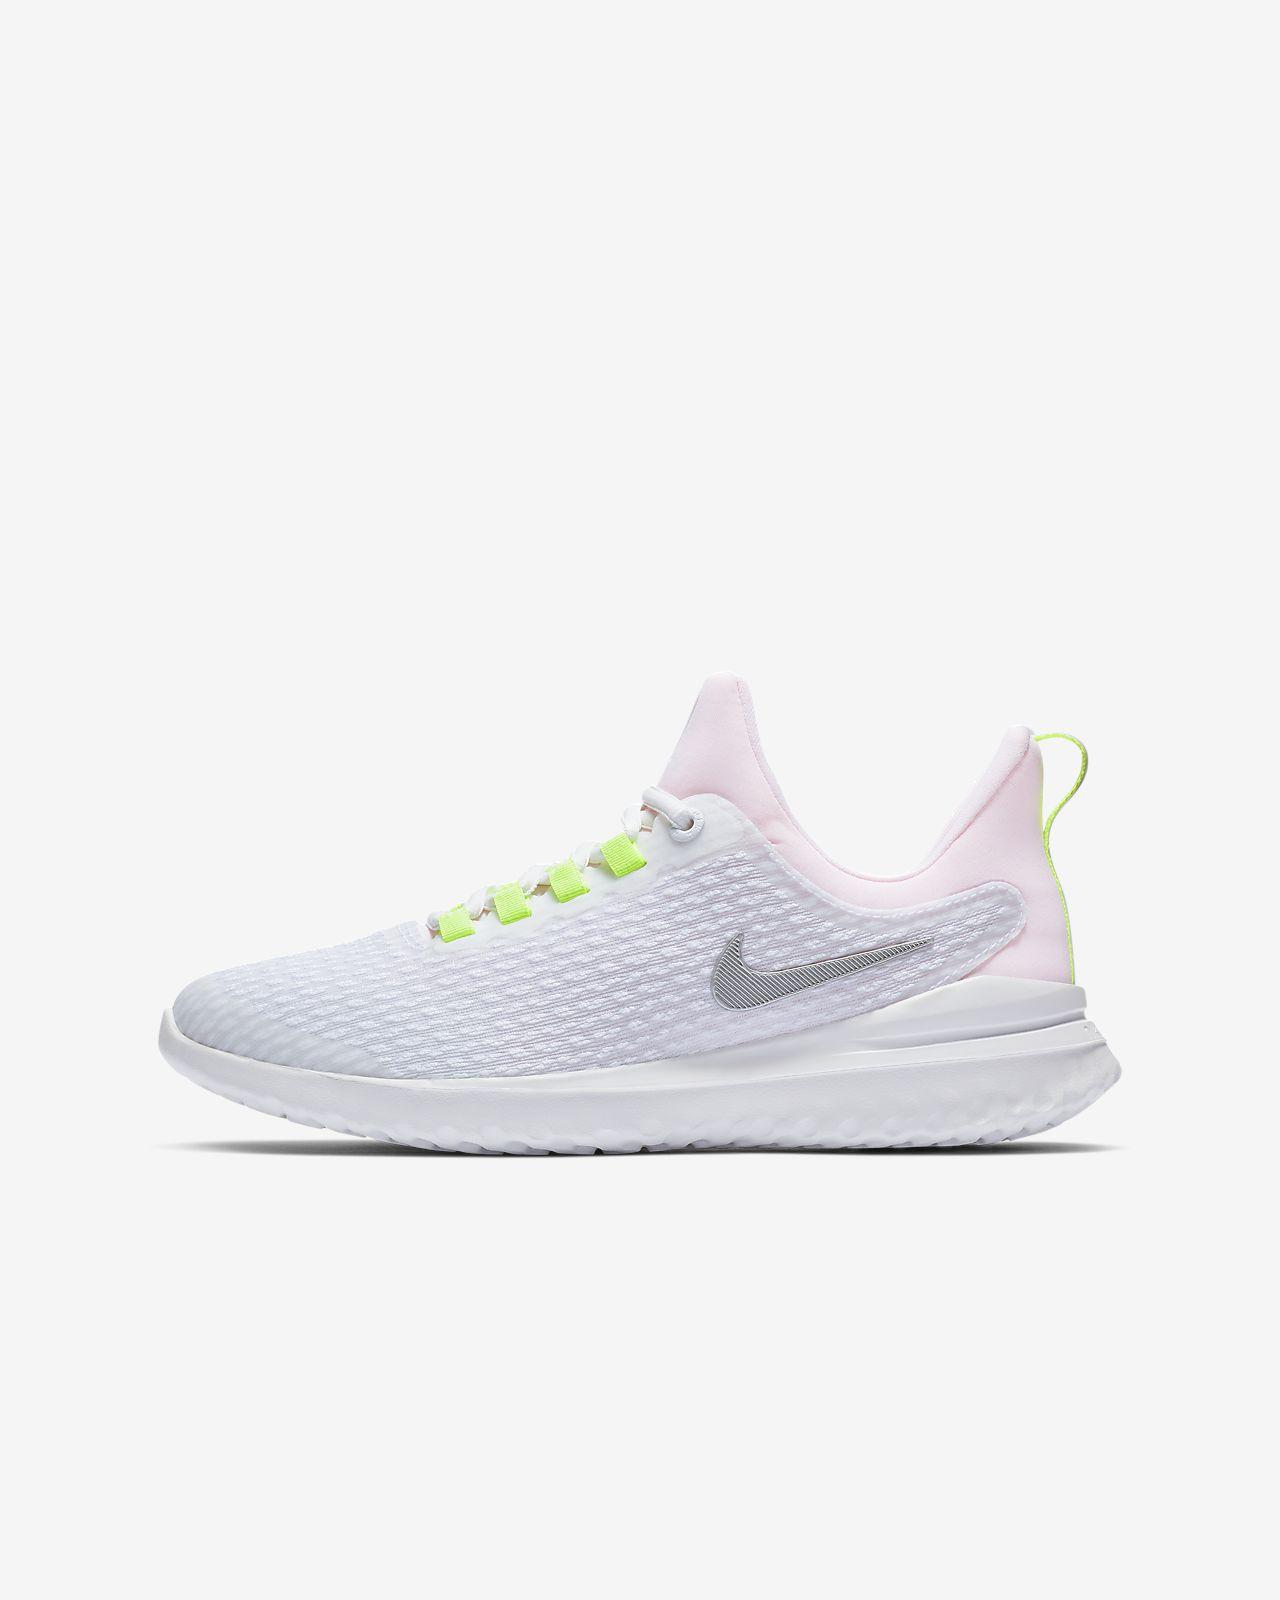 05c937641039 Nike Renew Rival Older Kids  Running Shoe. Nike.com GB